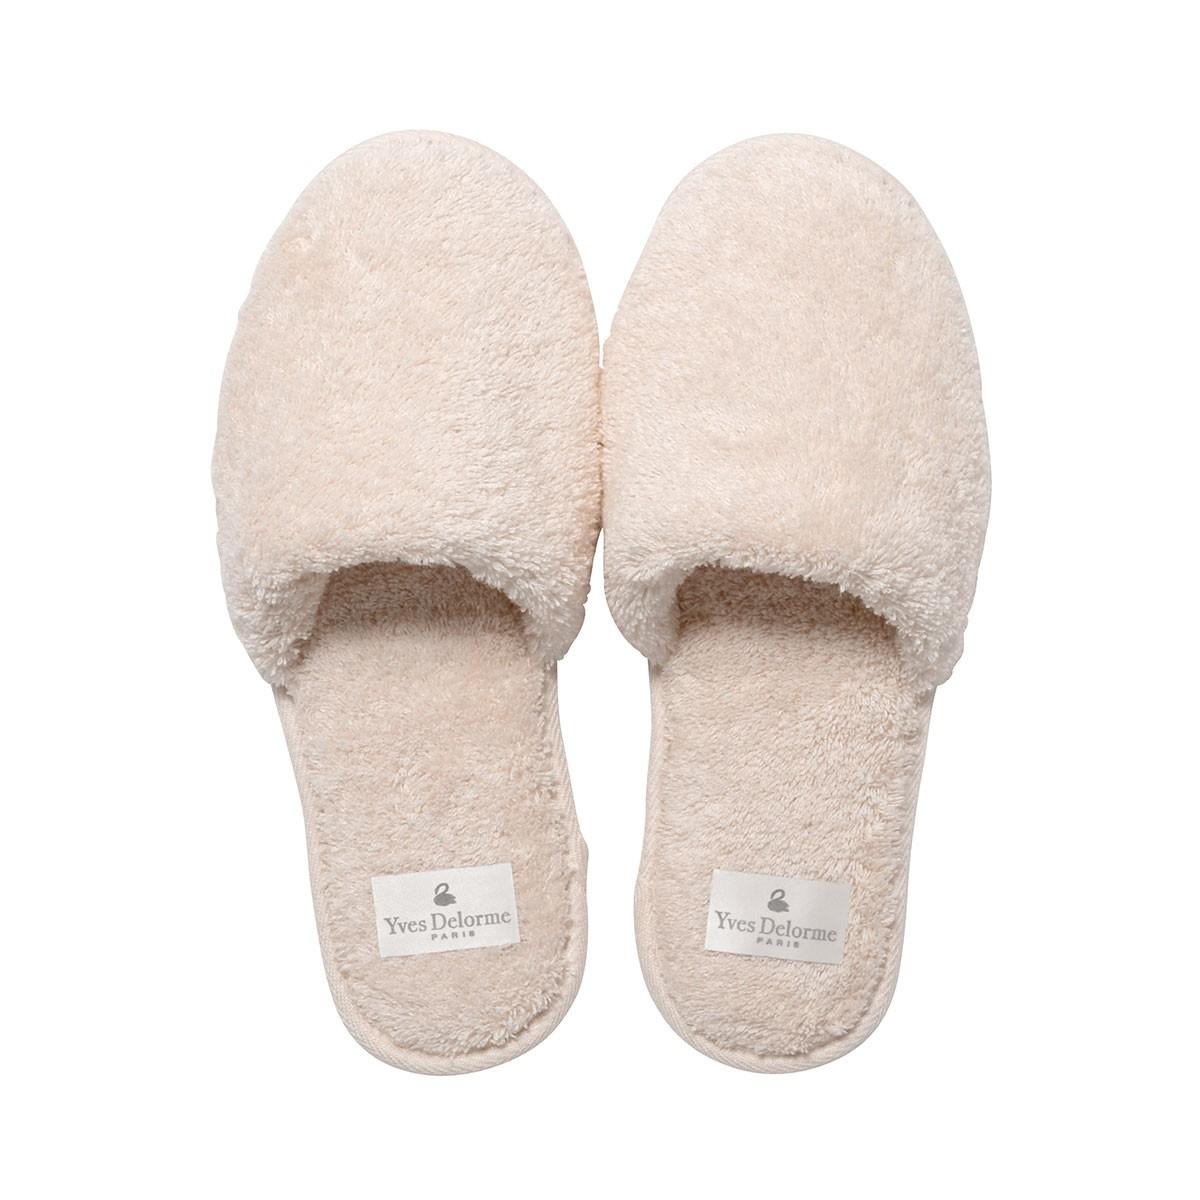 280647c2f9 Yves Delorme - Etoile Women s Slippers